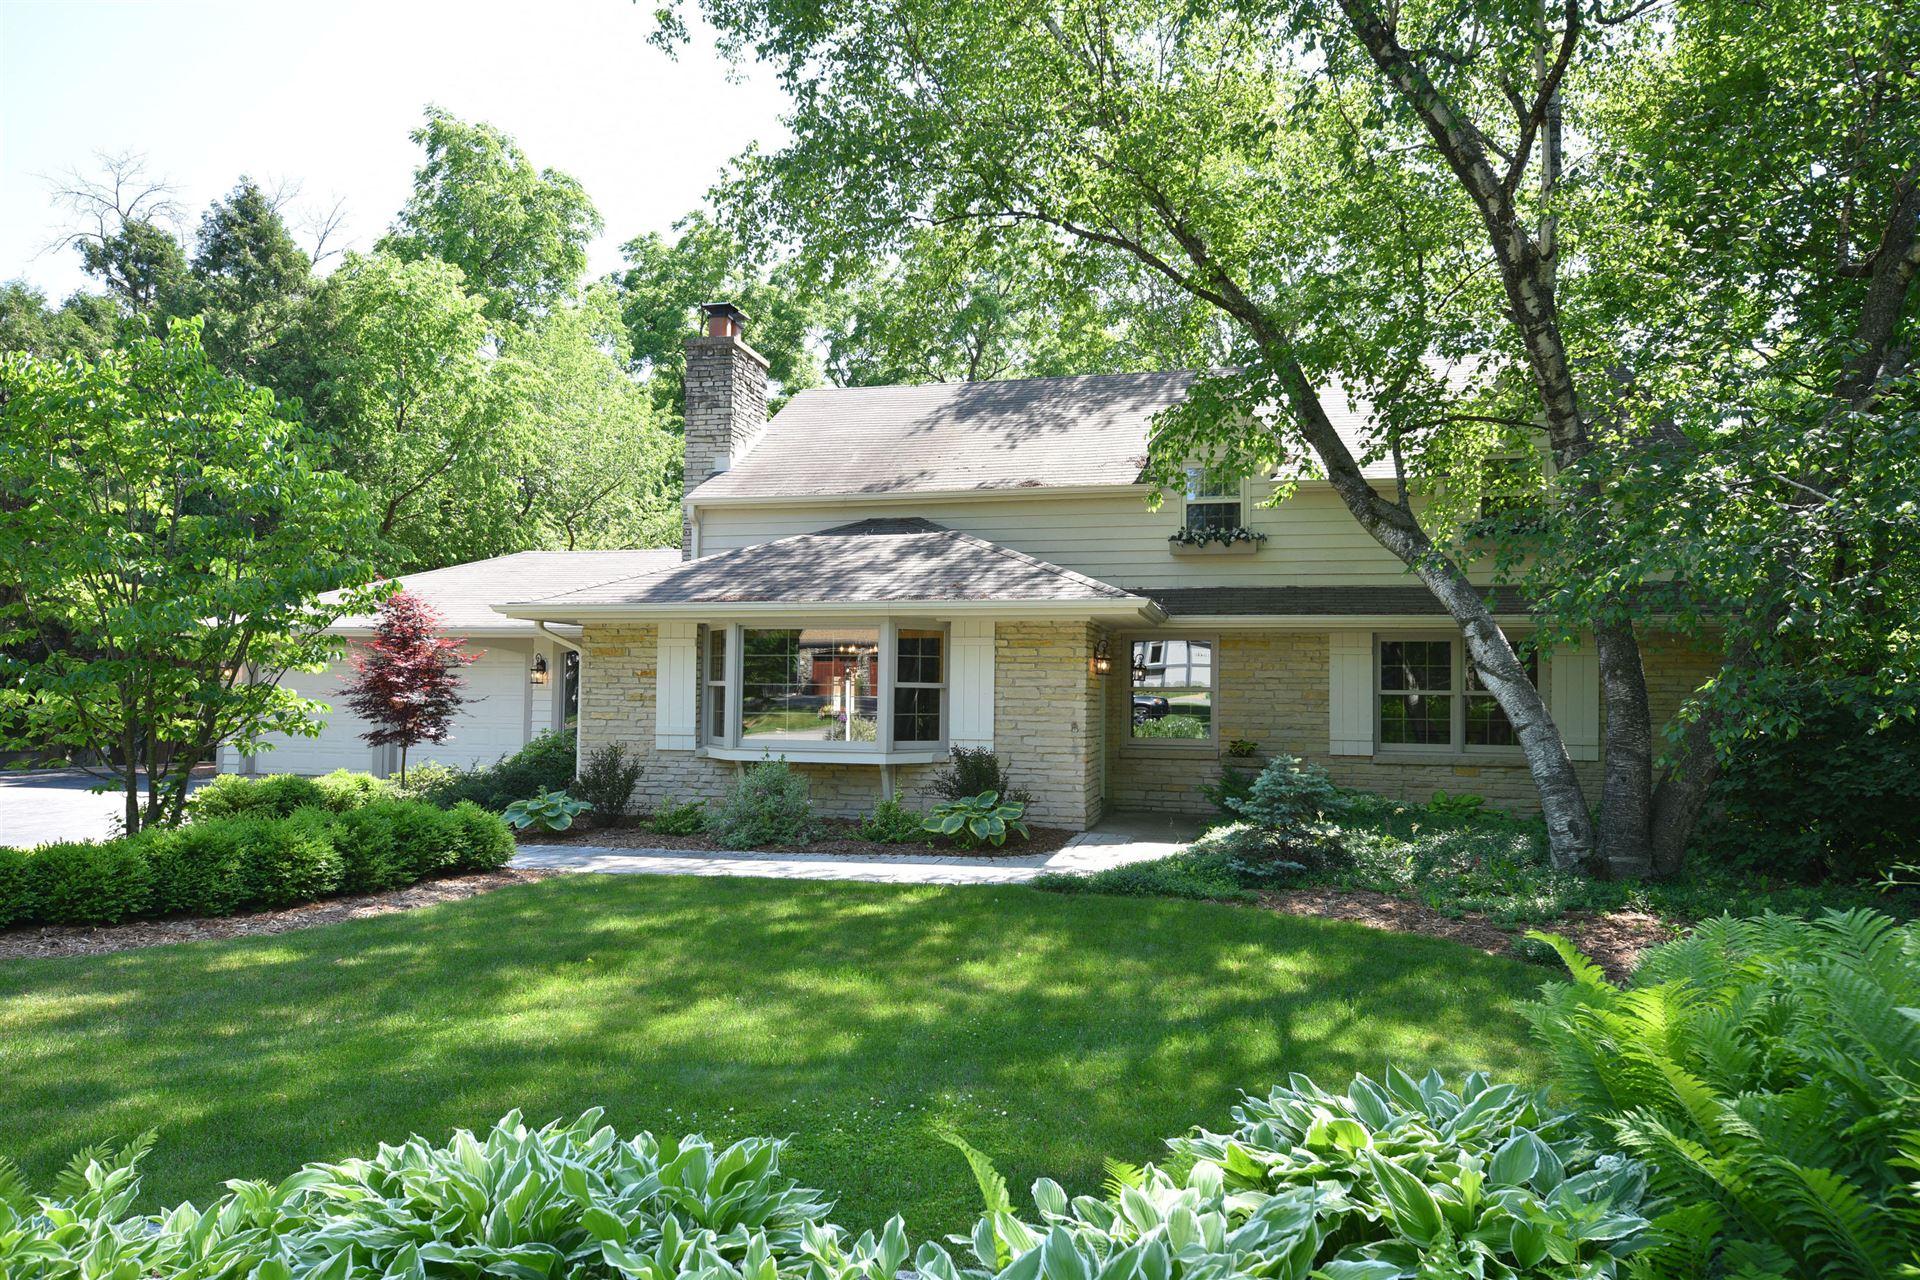 1040 Lower Ridgeway, Elm Grove, WI 53122 - #: 1694589